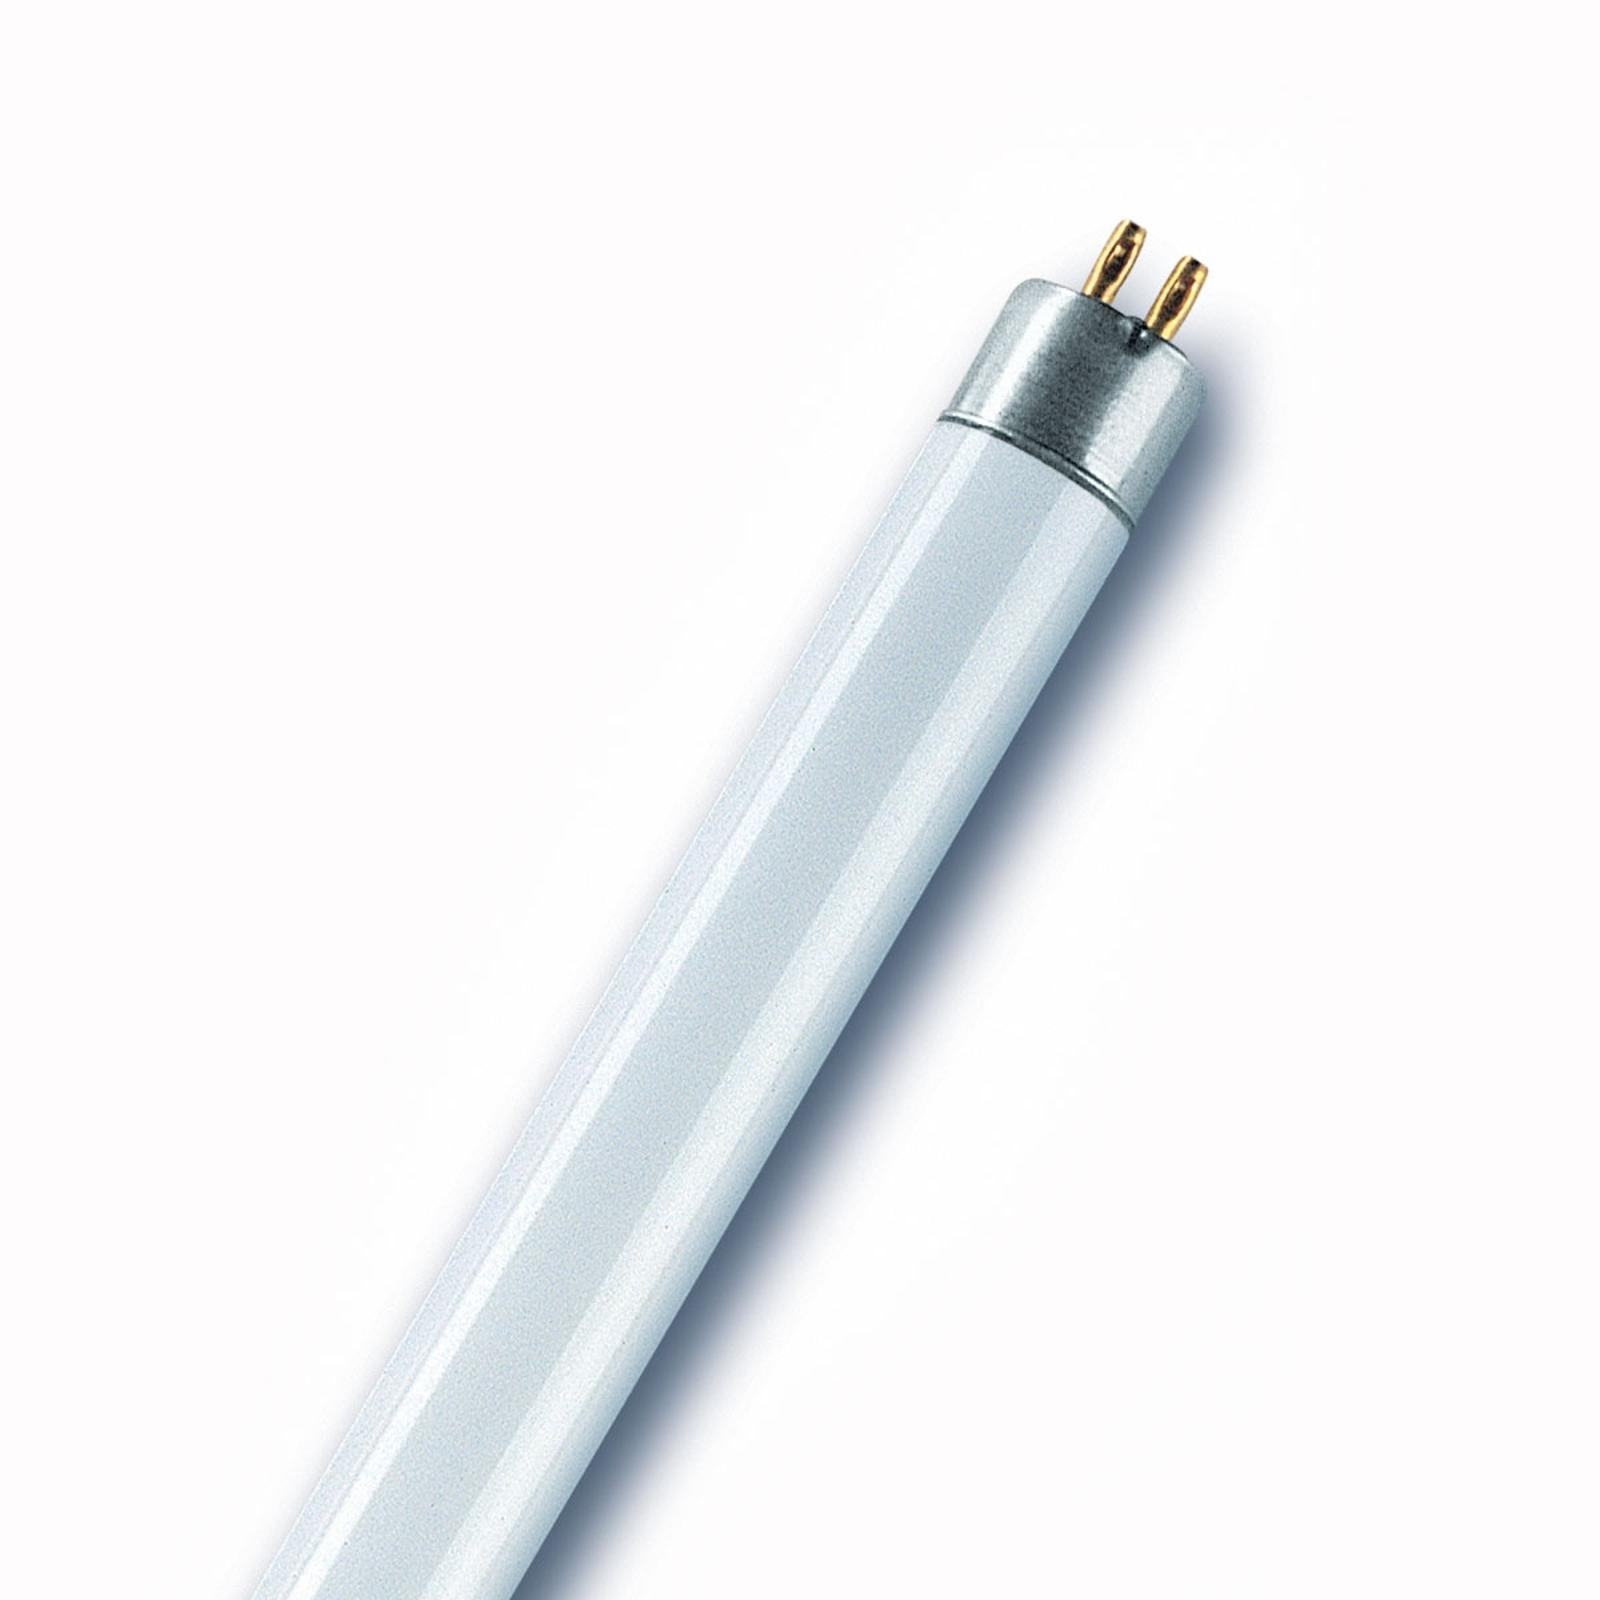 Leuchtstoffröhre G5 T5 54W 865 Lumilux HO